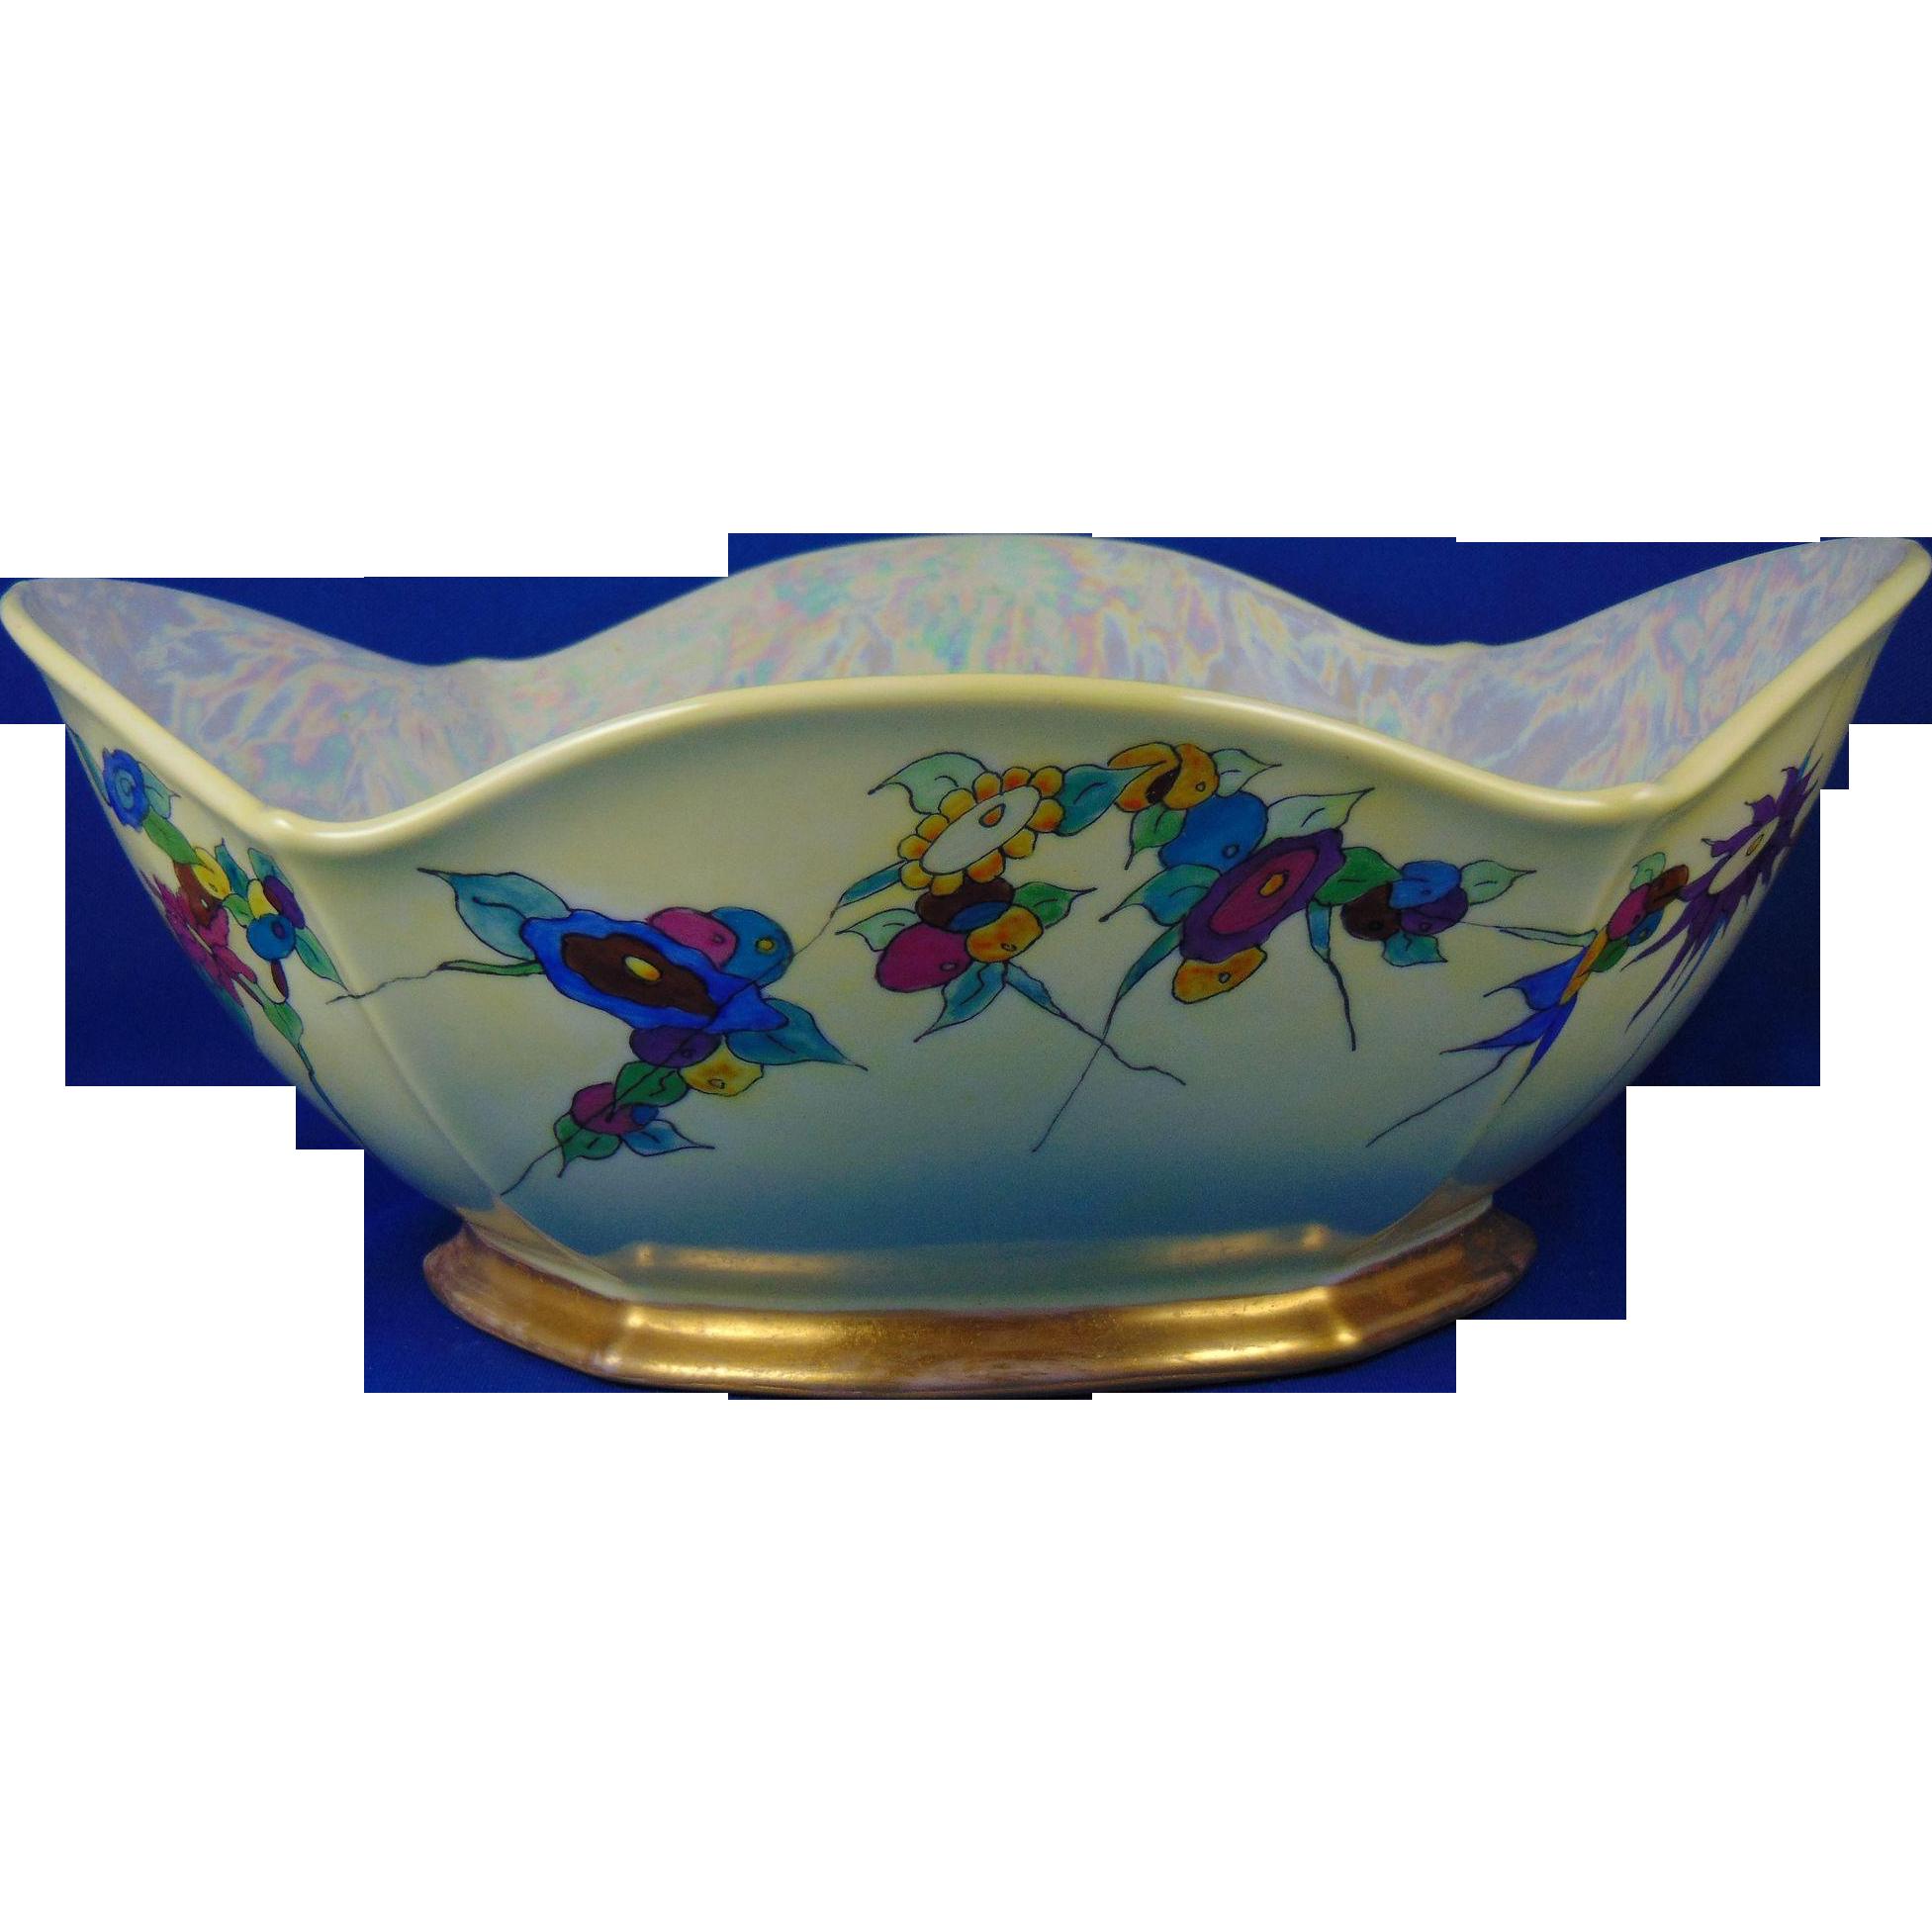 "Porcelain Blank Art Deco Floral Design Centerpiece Bowl (Signed ""Alpha Walker Witt""/Dated 1939)"